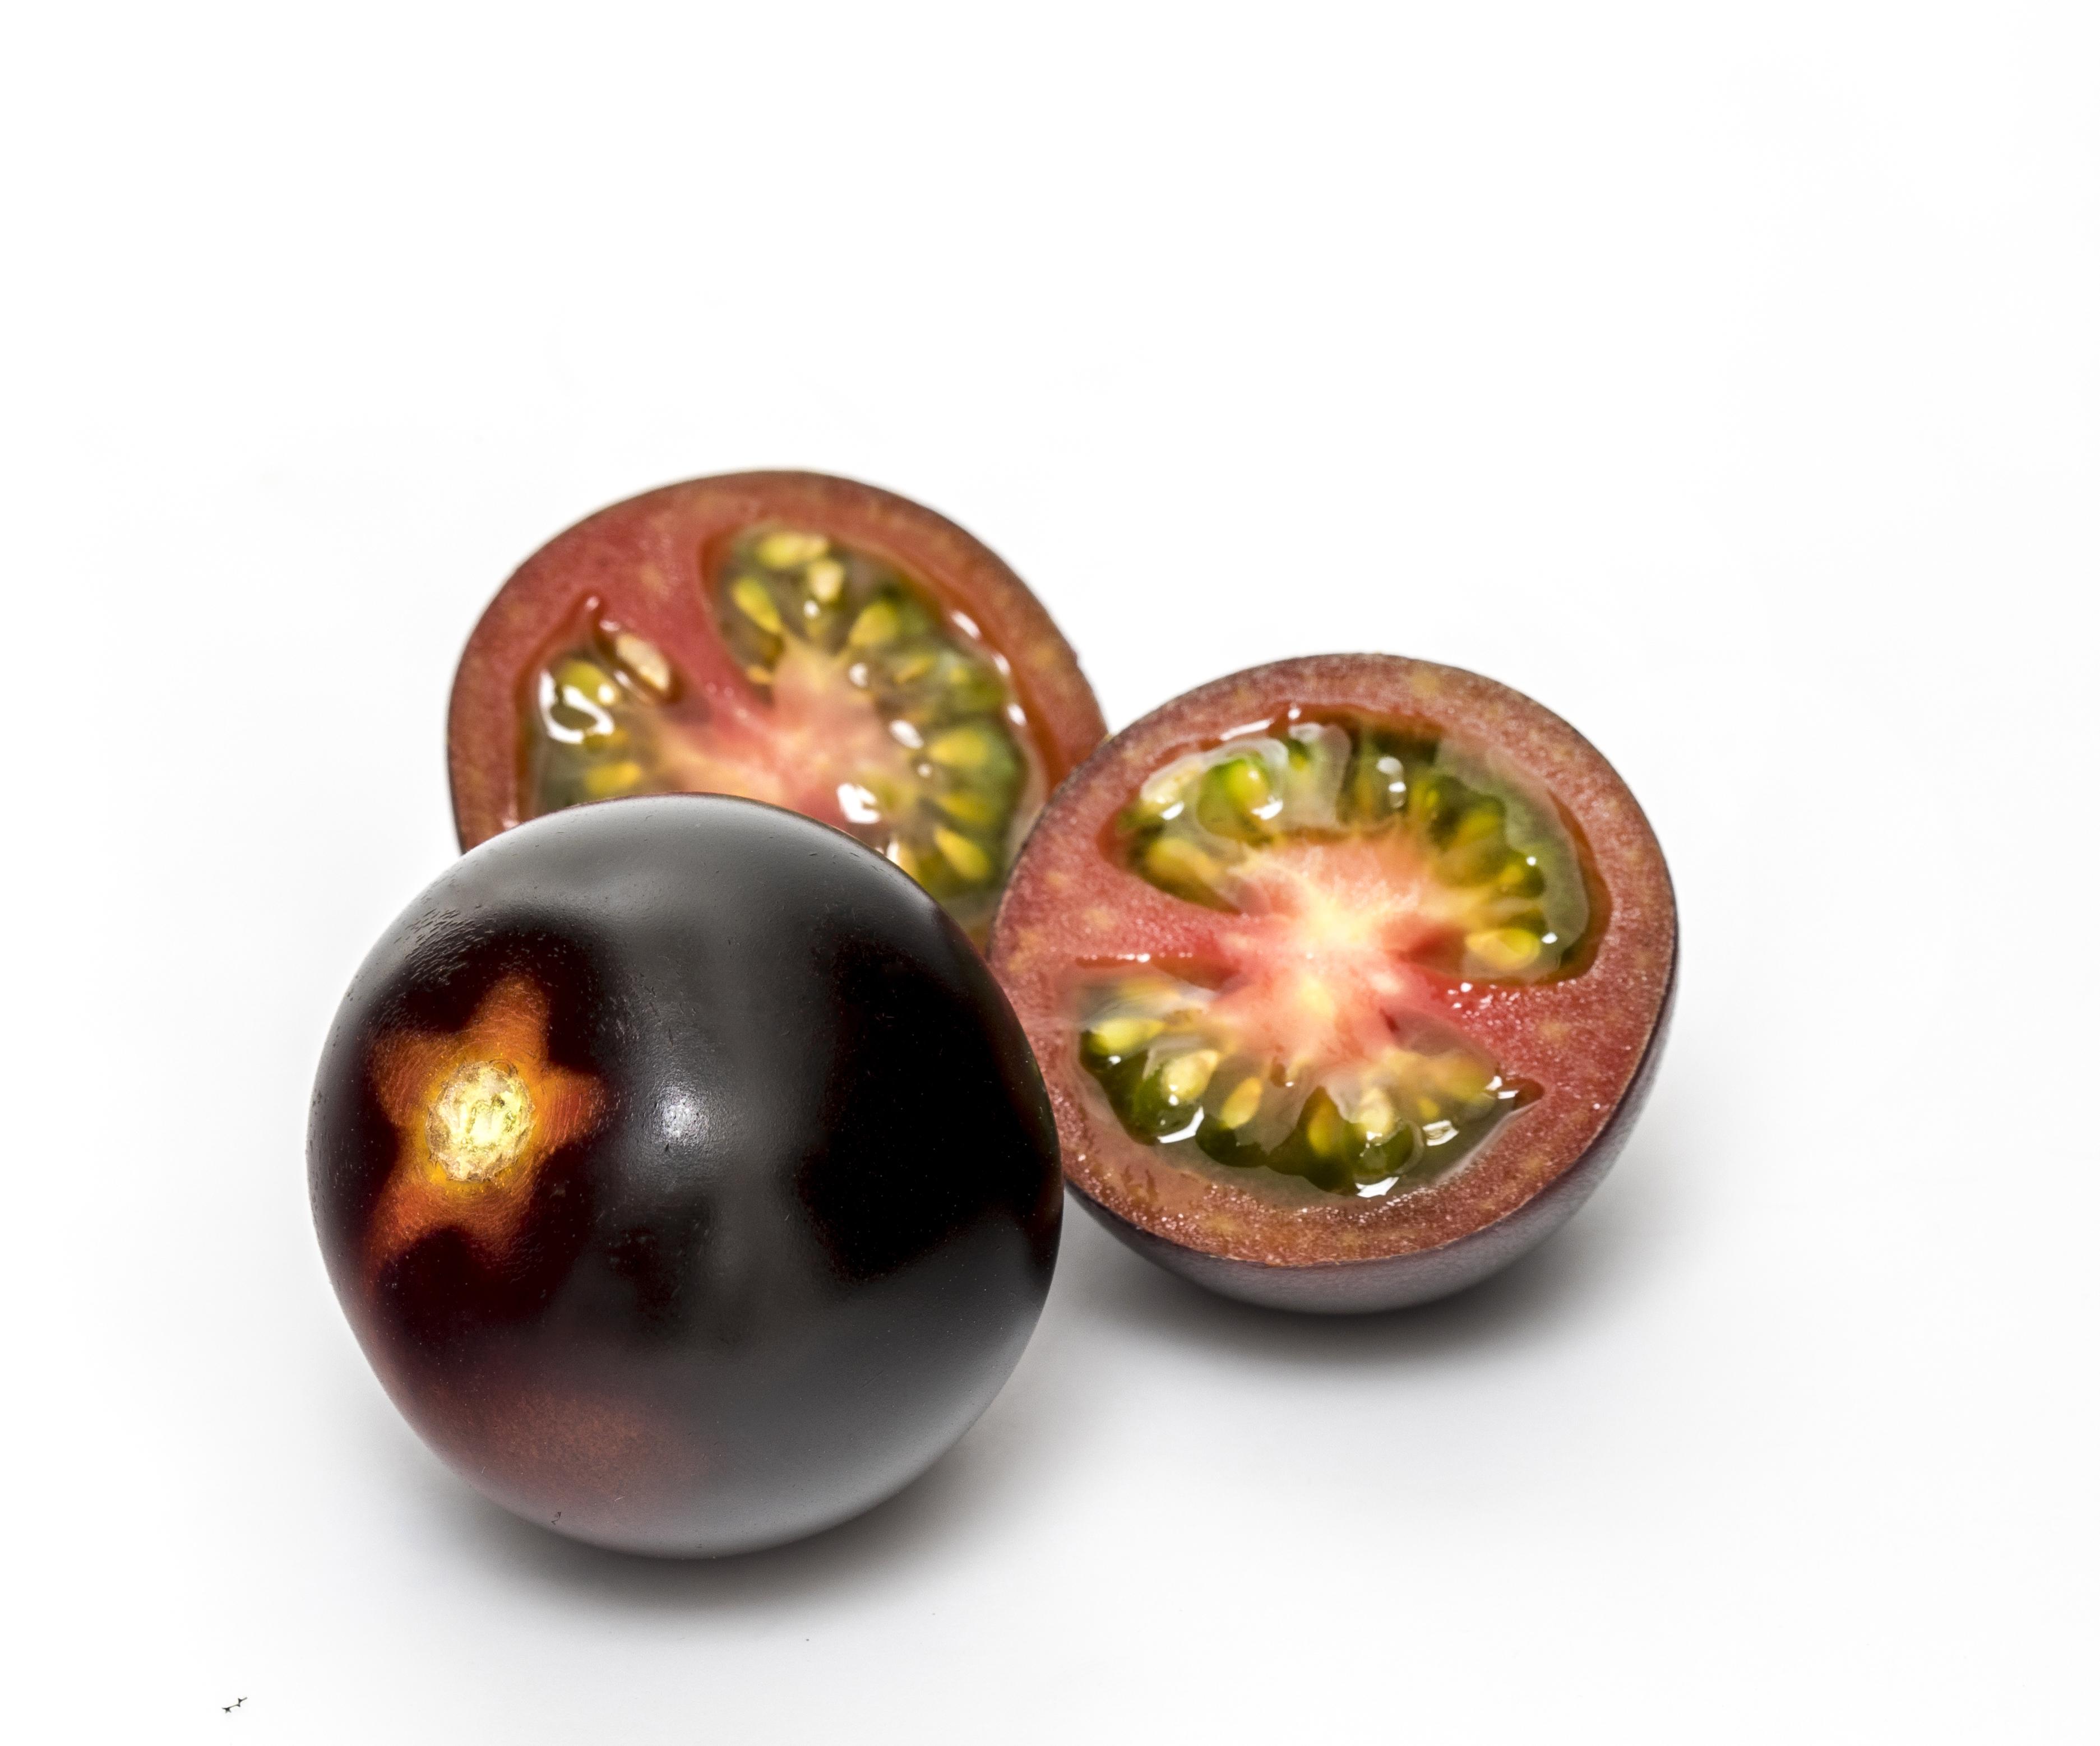 YOOM tomato